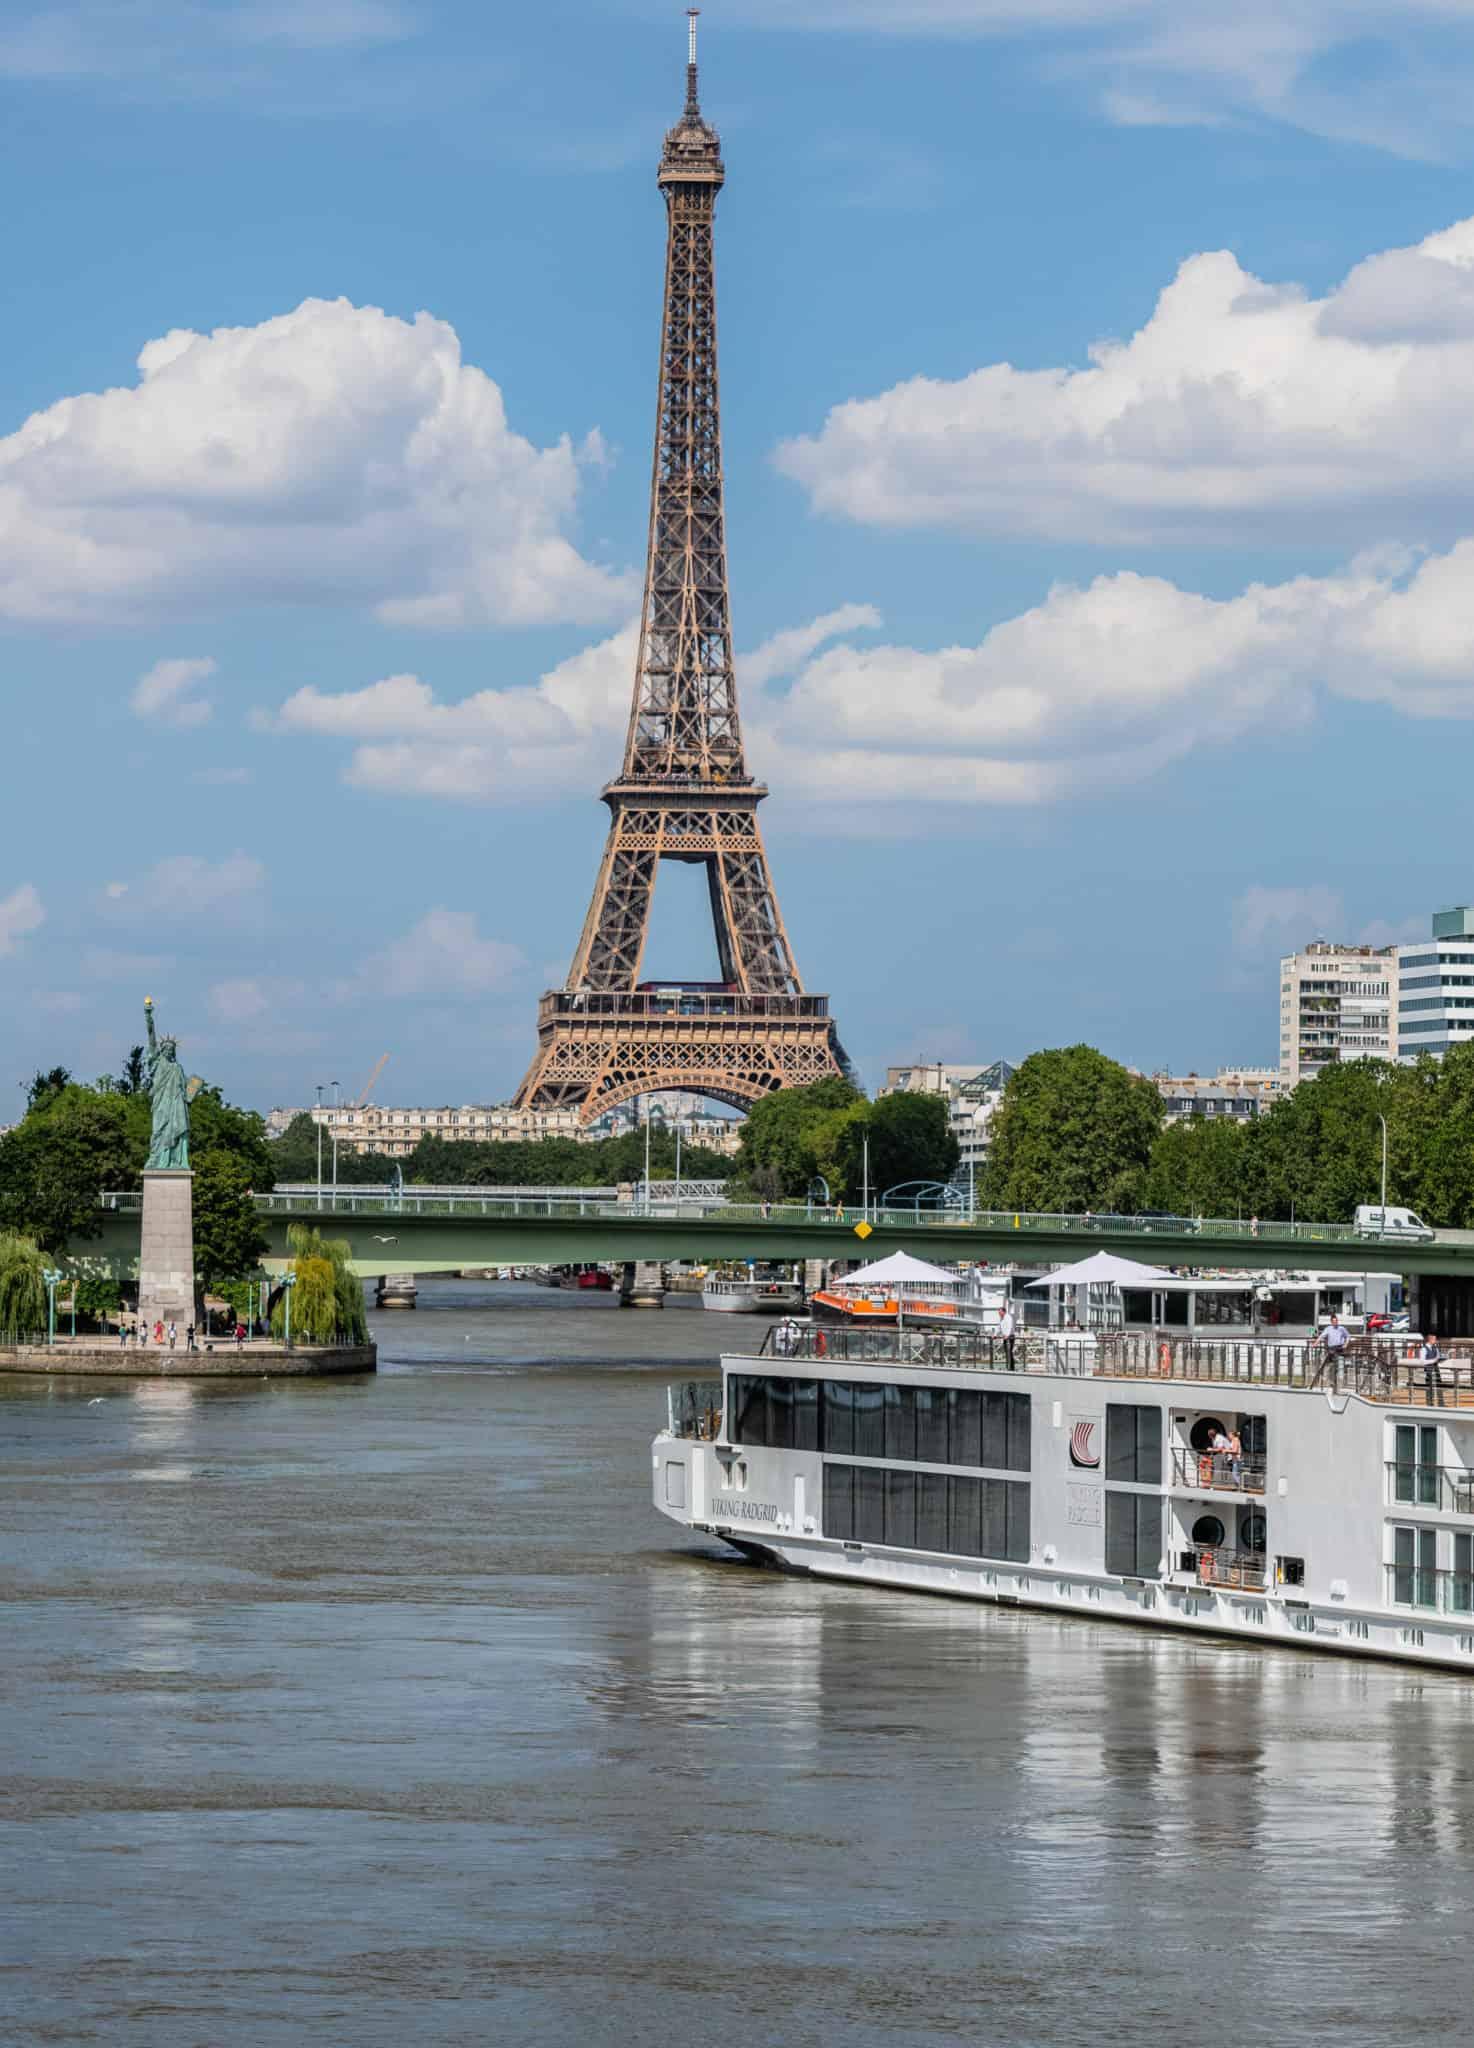 viking river cruises longship paris france eiffel tower